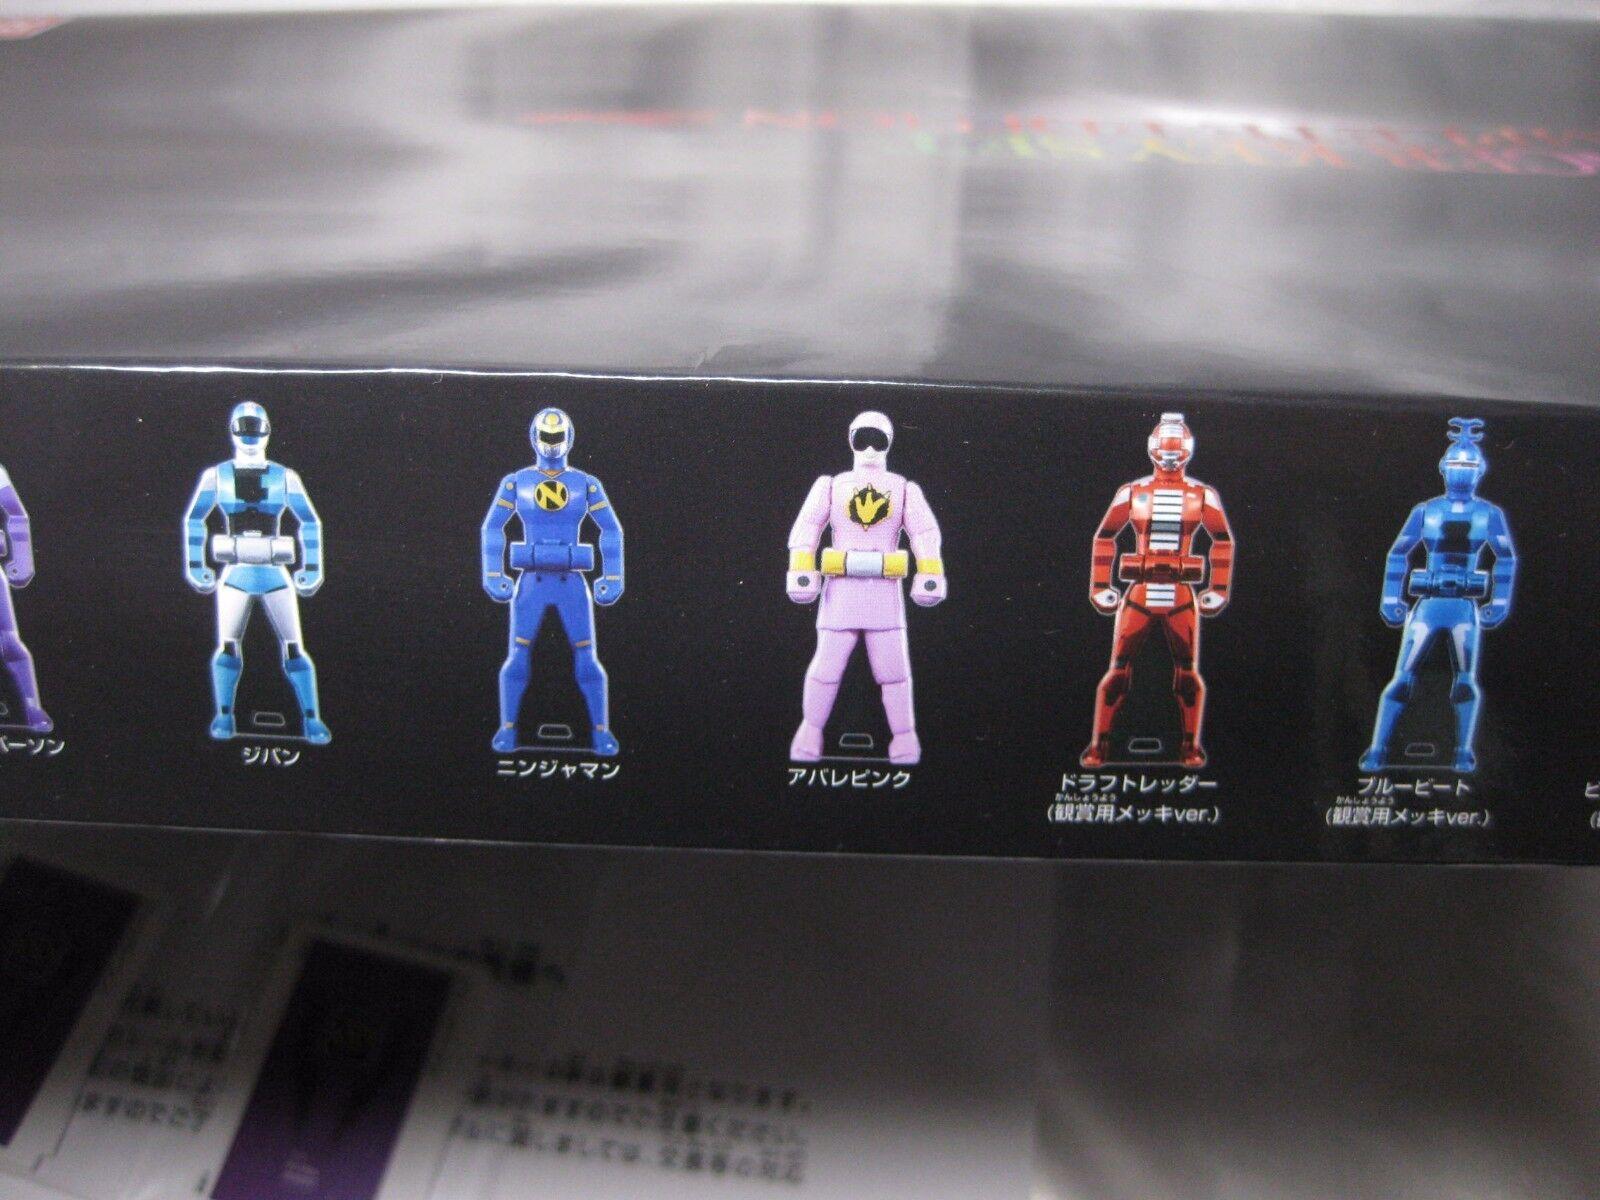 Power Rangers Rangers Rangers Super Megaforc Ranger Key Set Complete Edition Limited NEW japan 1847e8